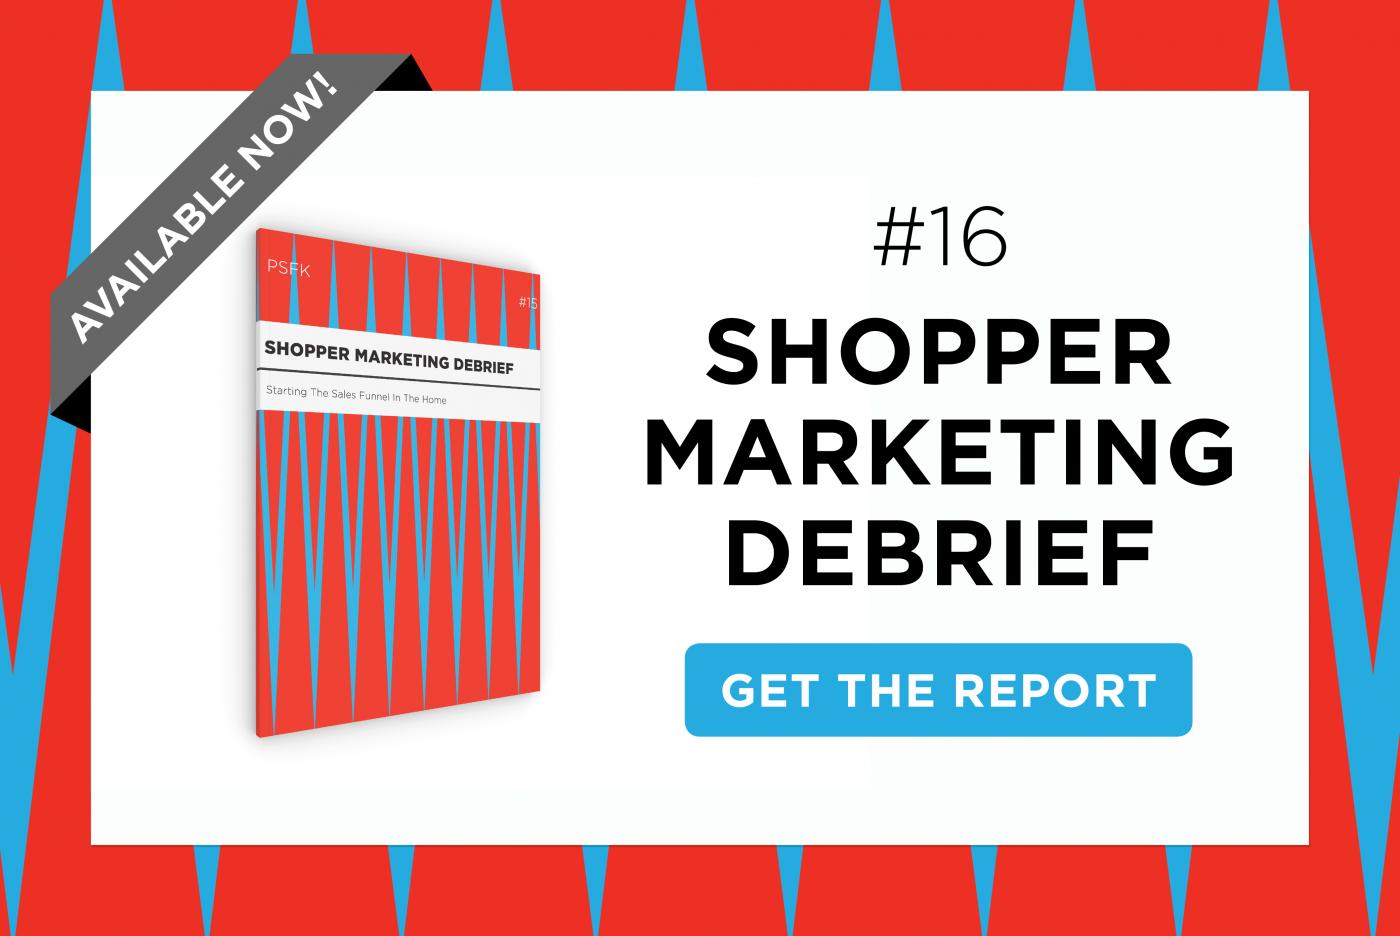 PSFK Launches The Shopper Marketing Debrief